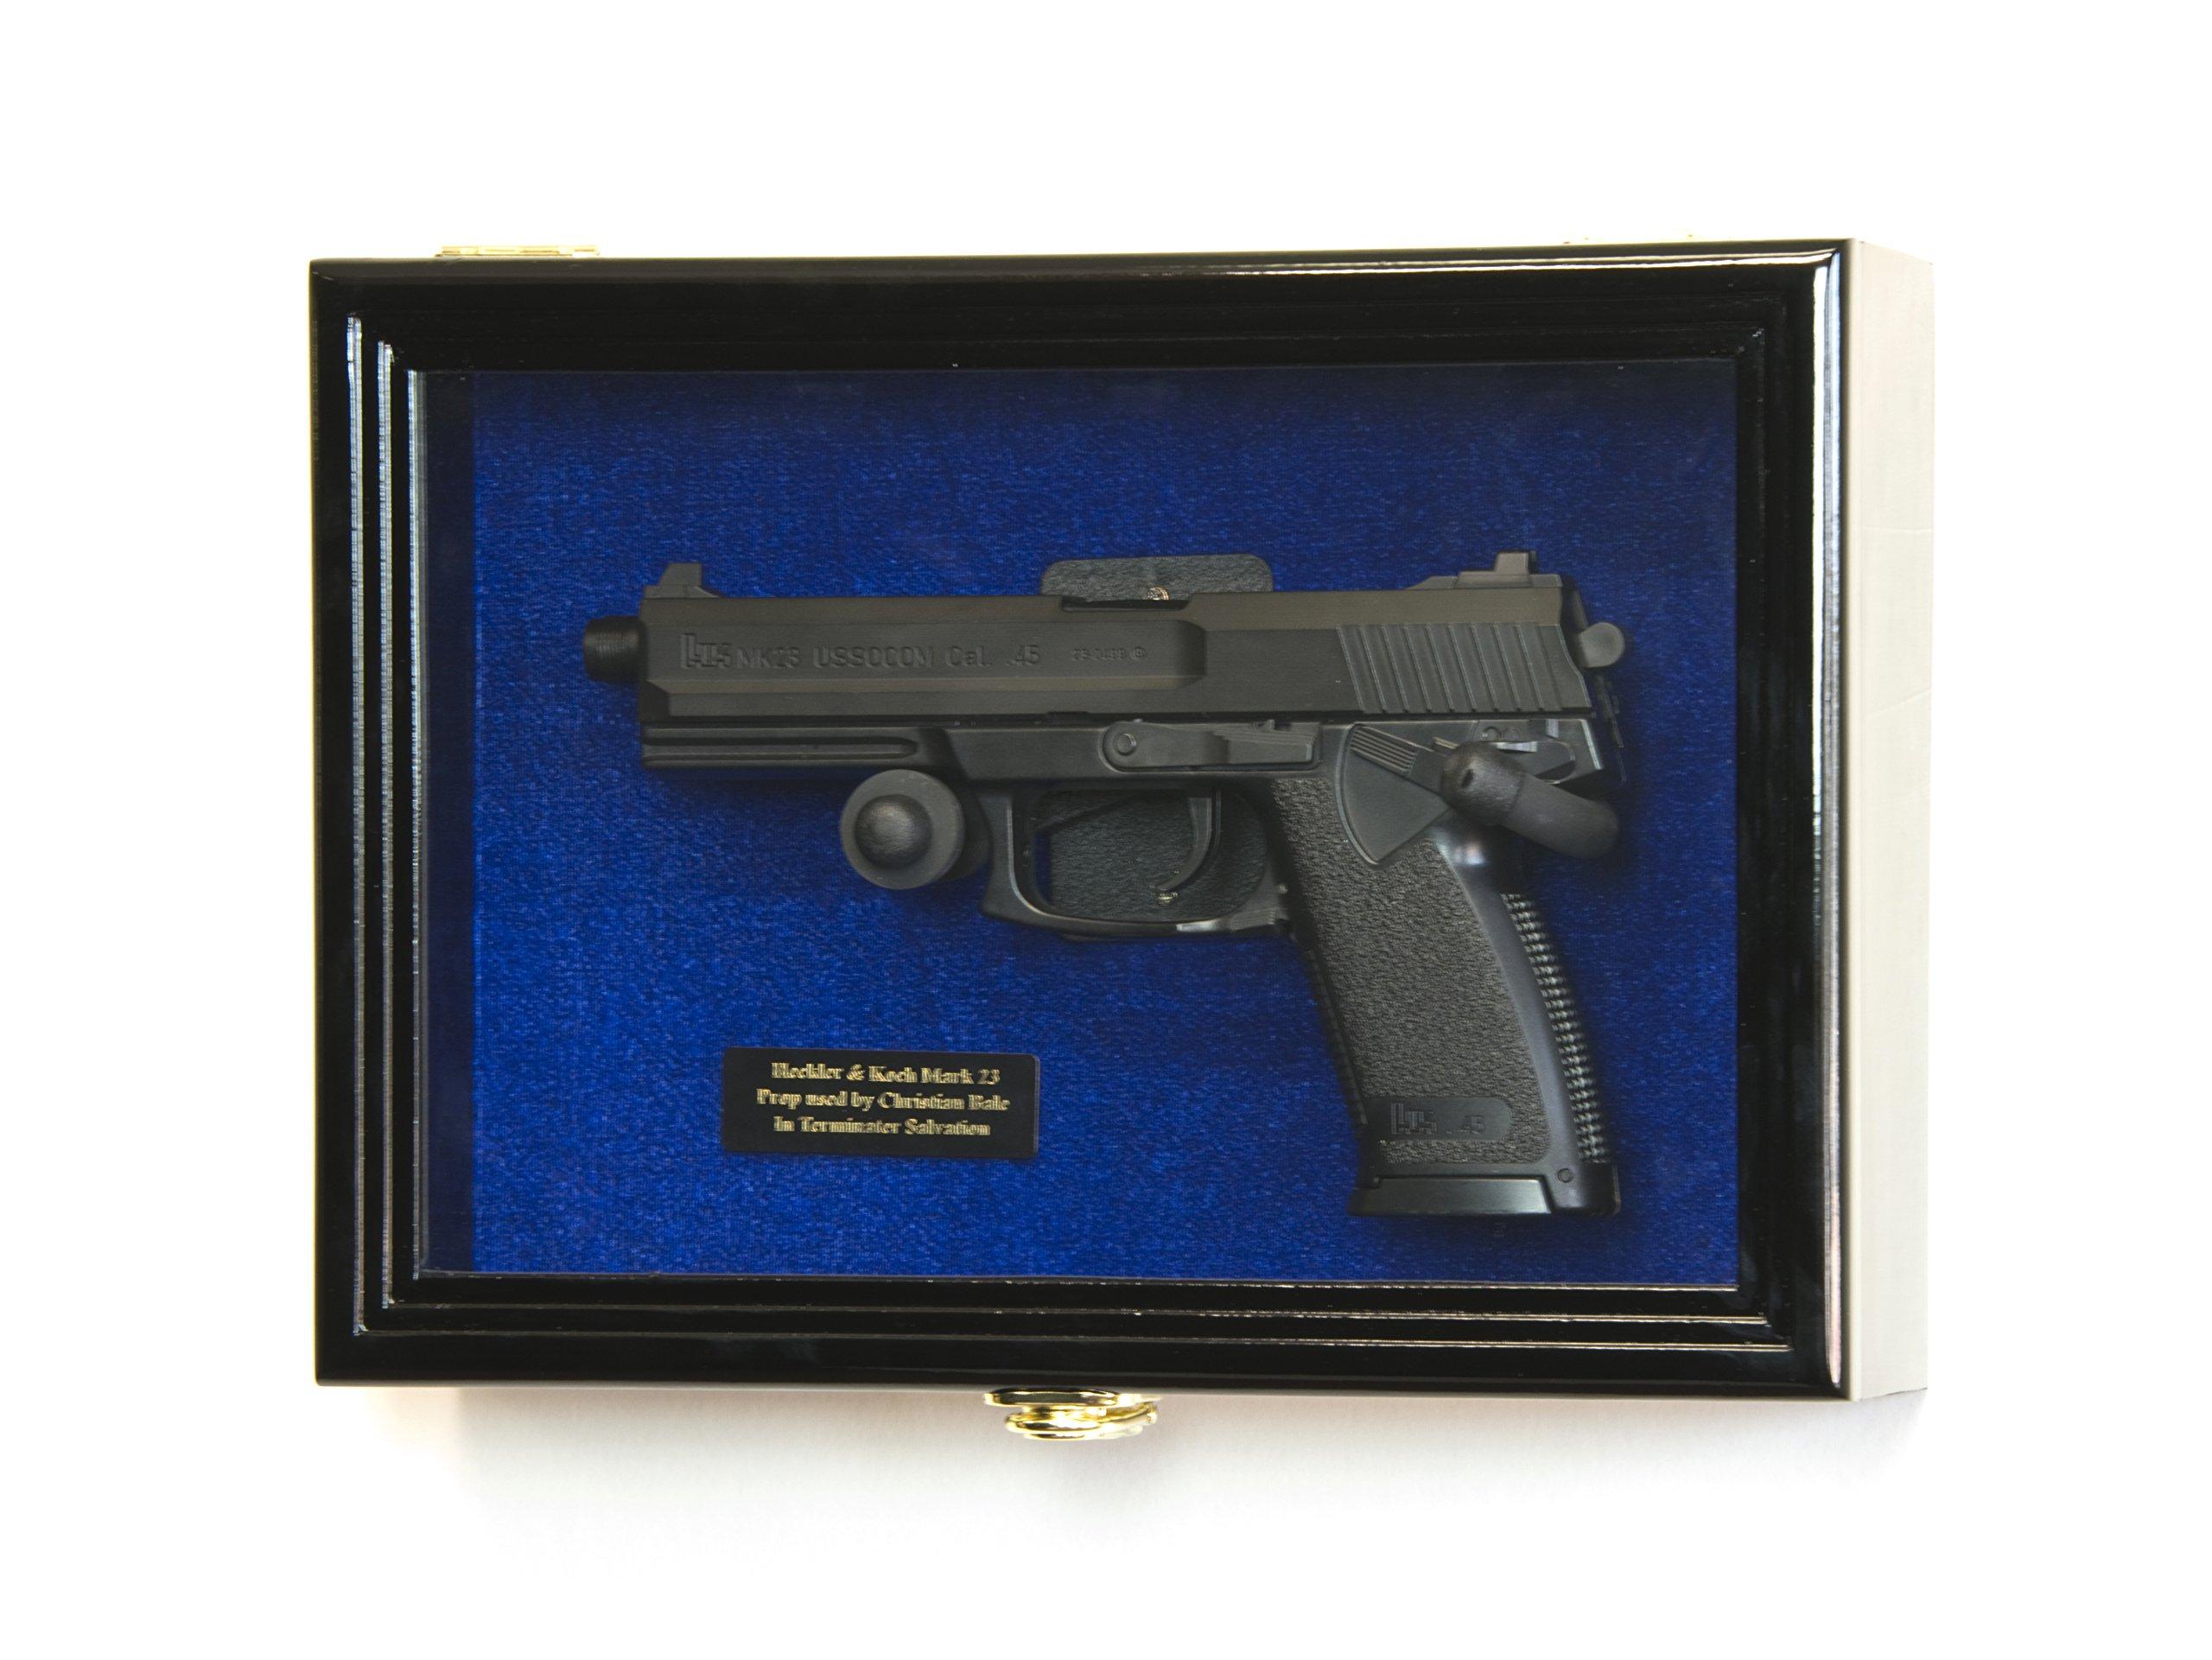 Single Pistol Display Case Wall Mount Solid Hardwood Cabinet (Black Finish, Blue Felt Background) by sfDisplay.com, Factory Direct Display Cases